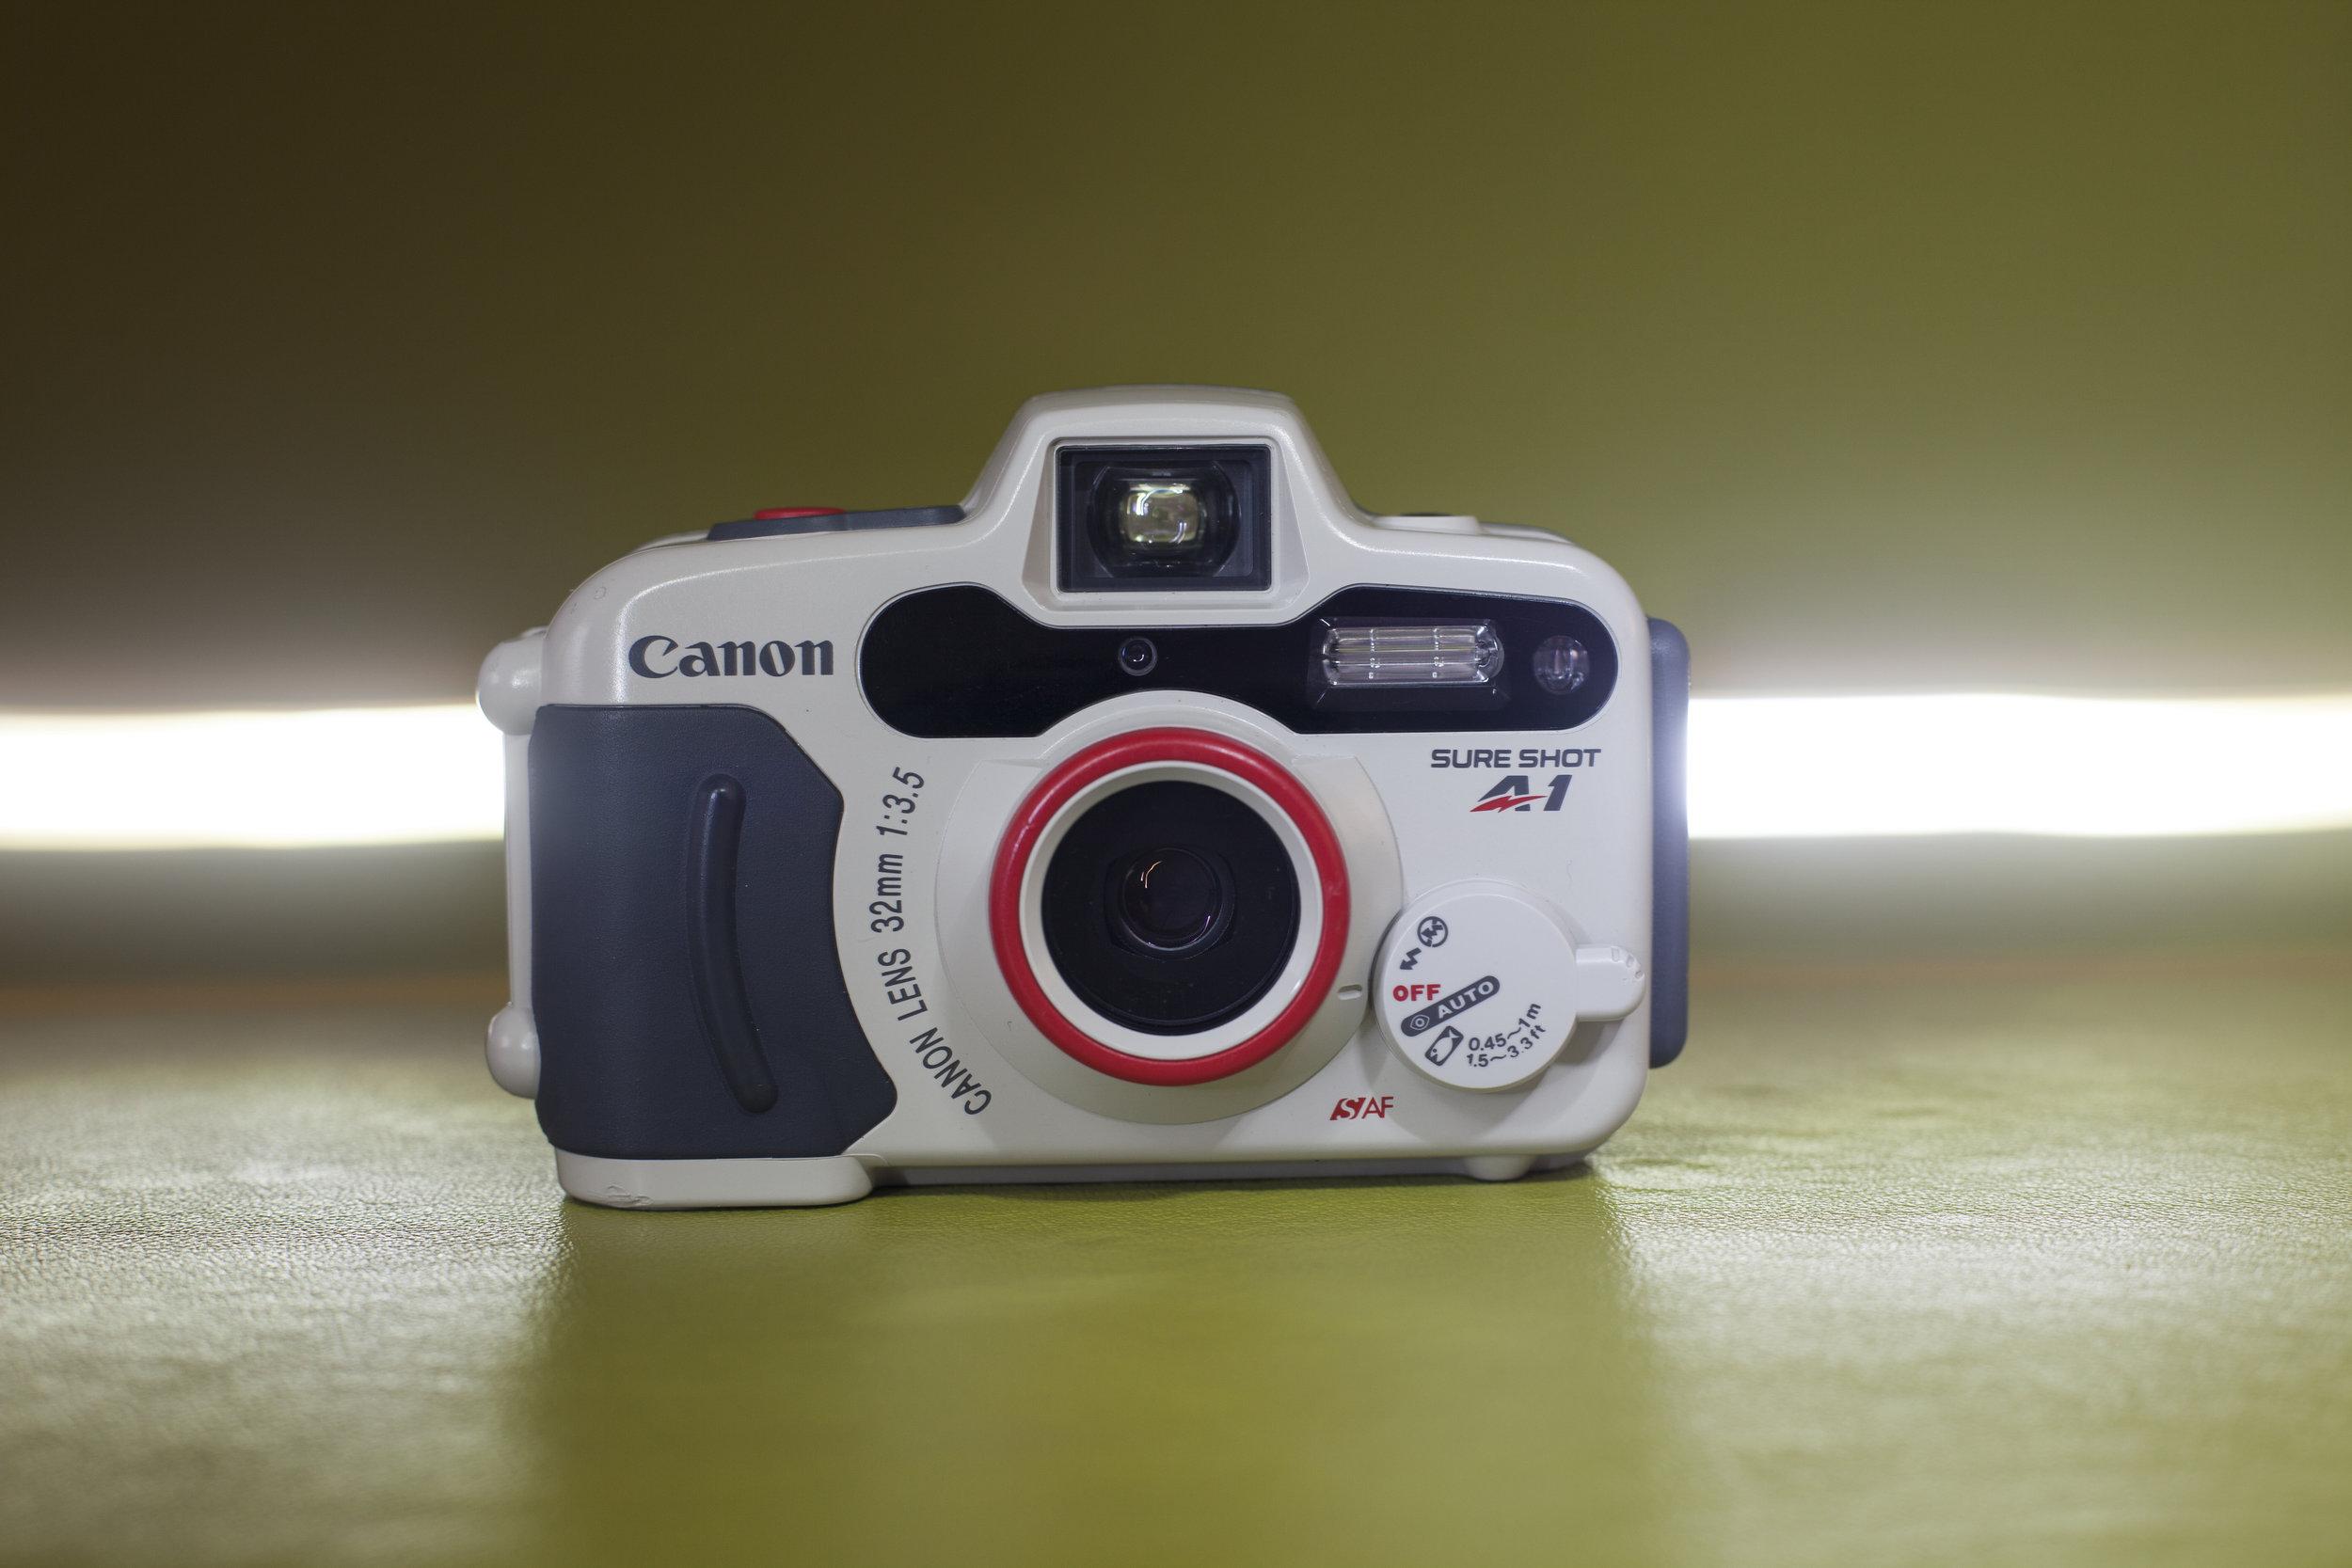 The Canon Sure Shot A1